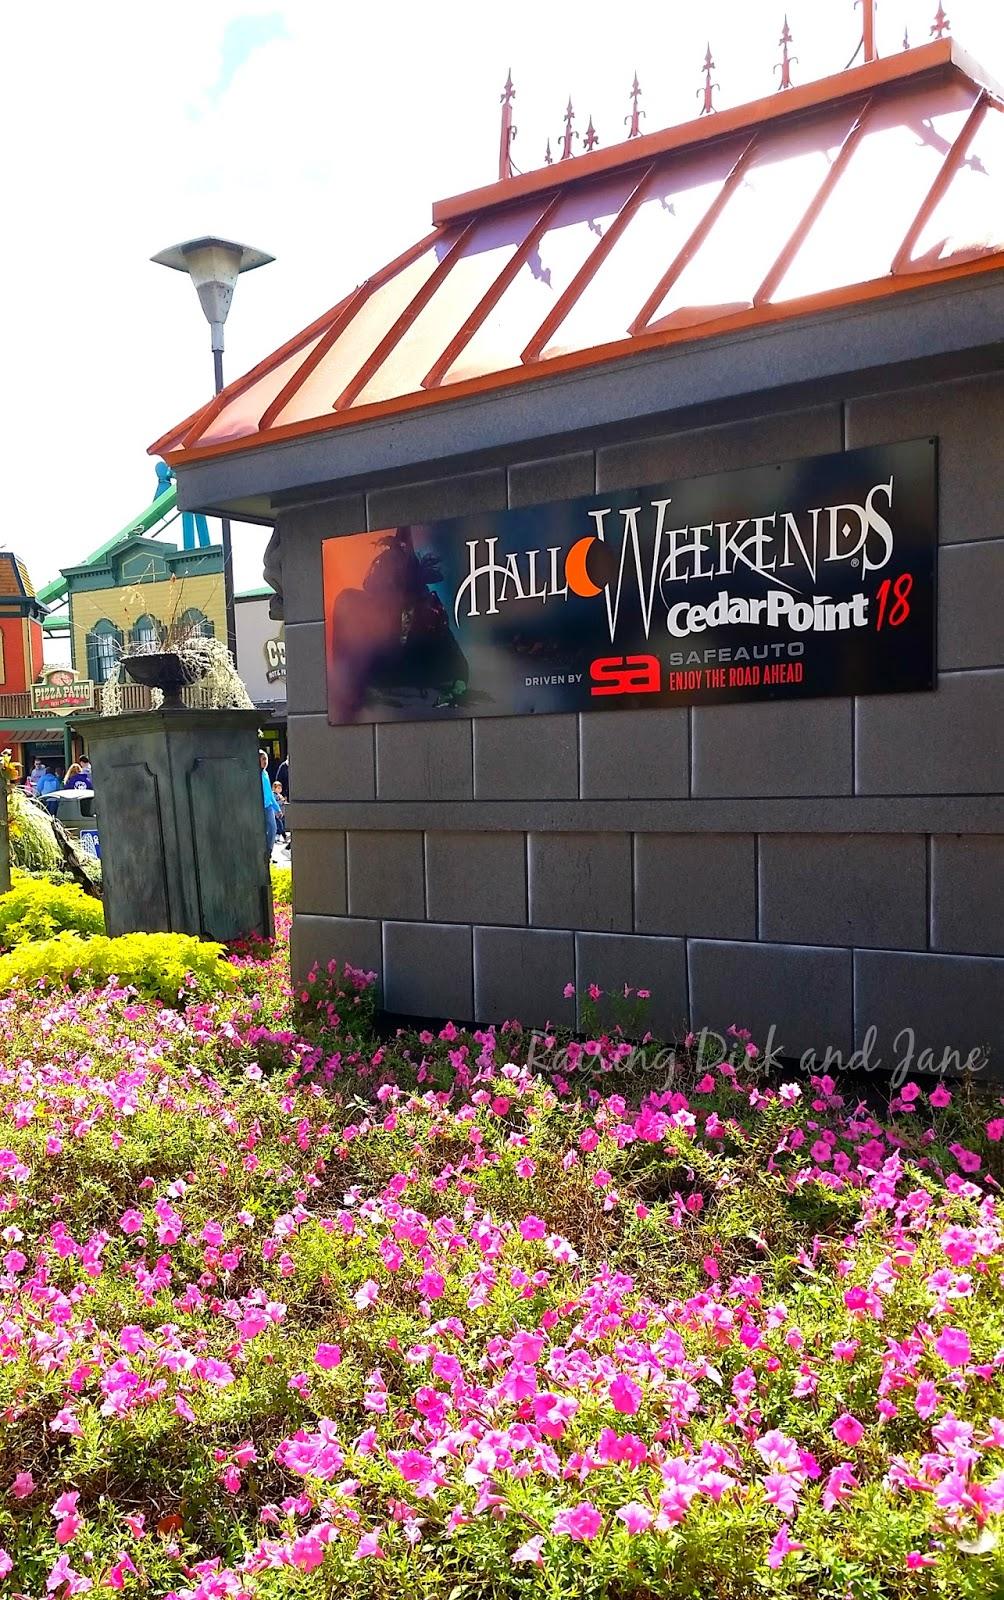 #ad Cedar Point Halloweekends